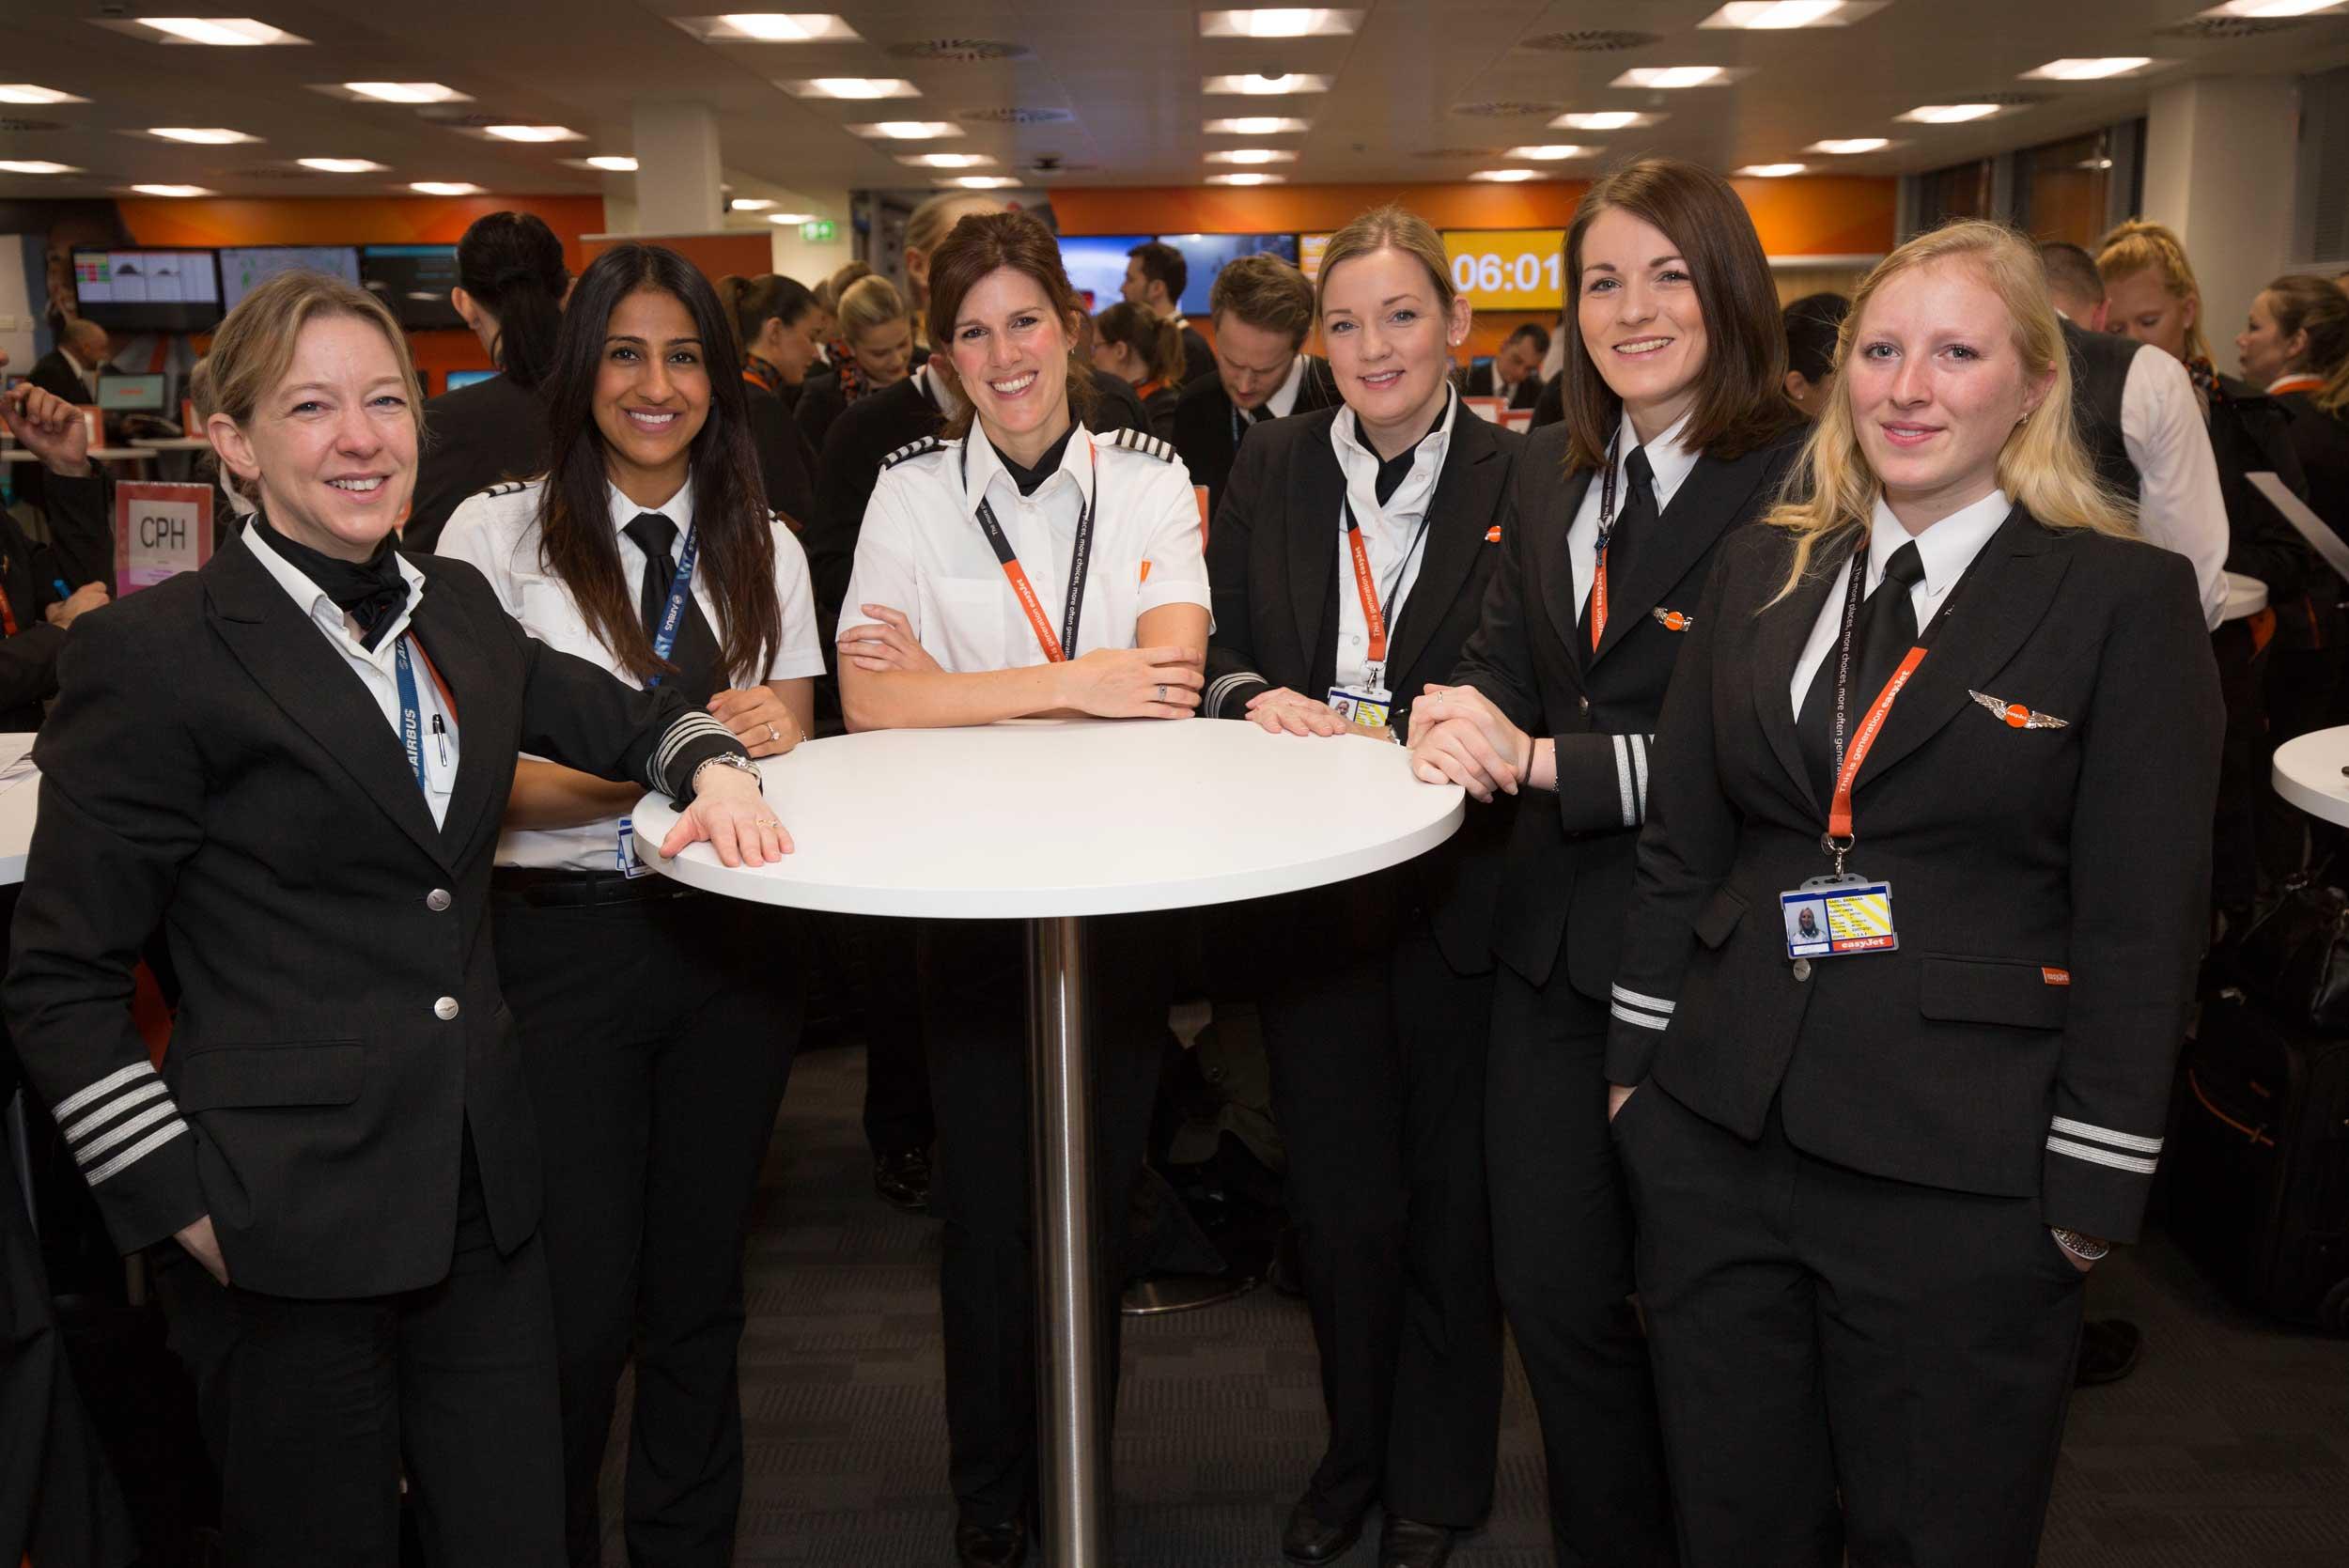 easyJet female crews